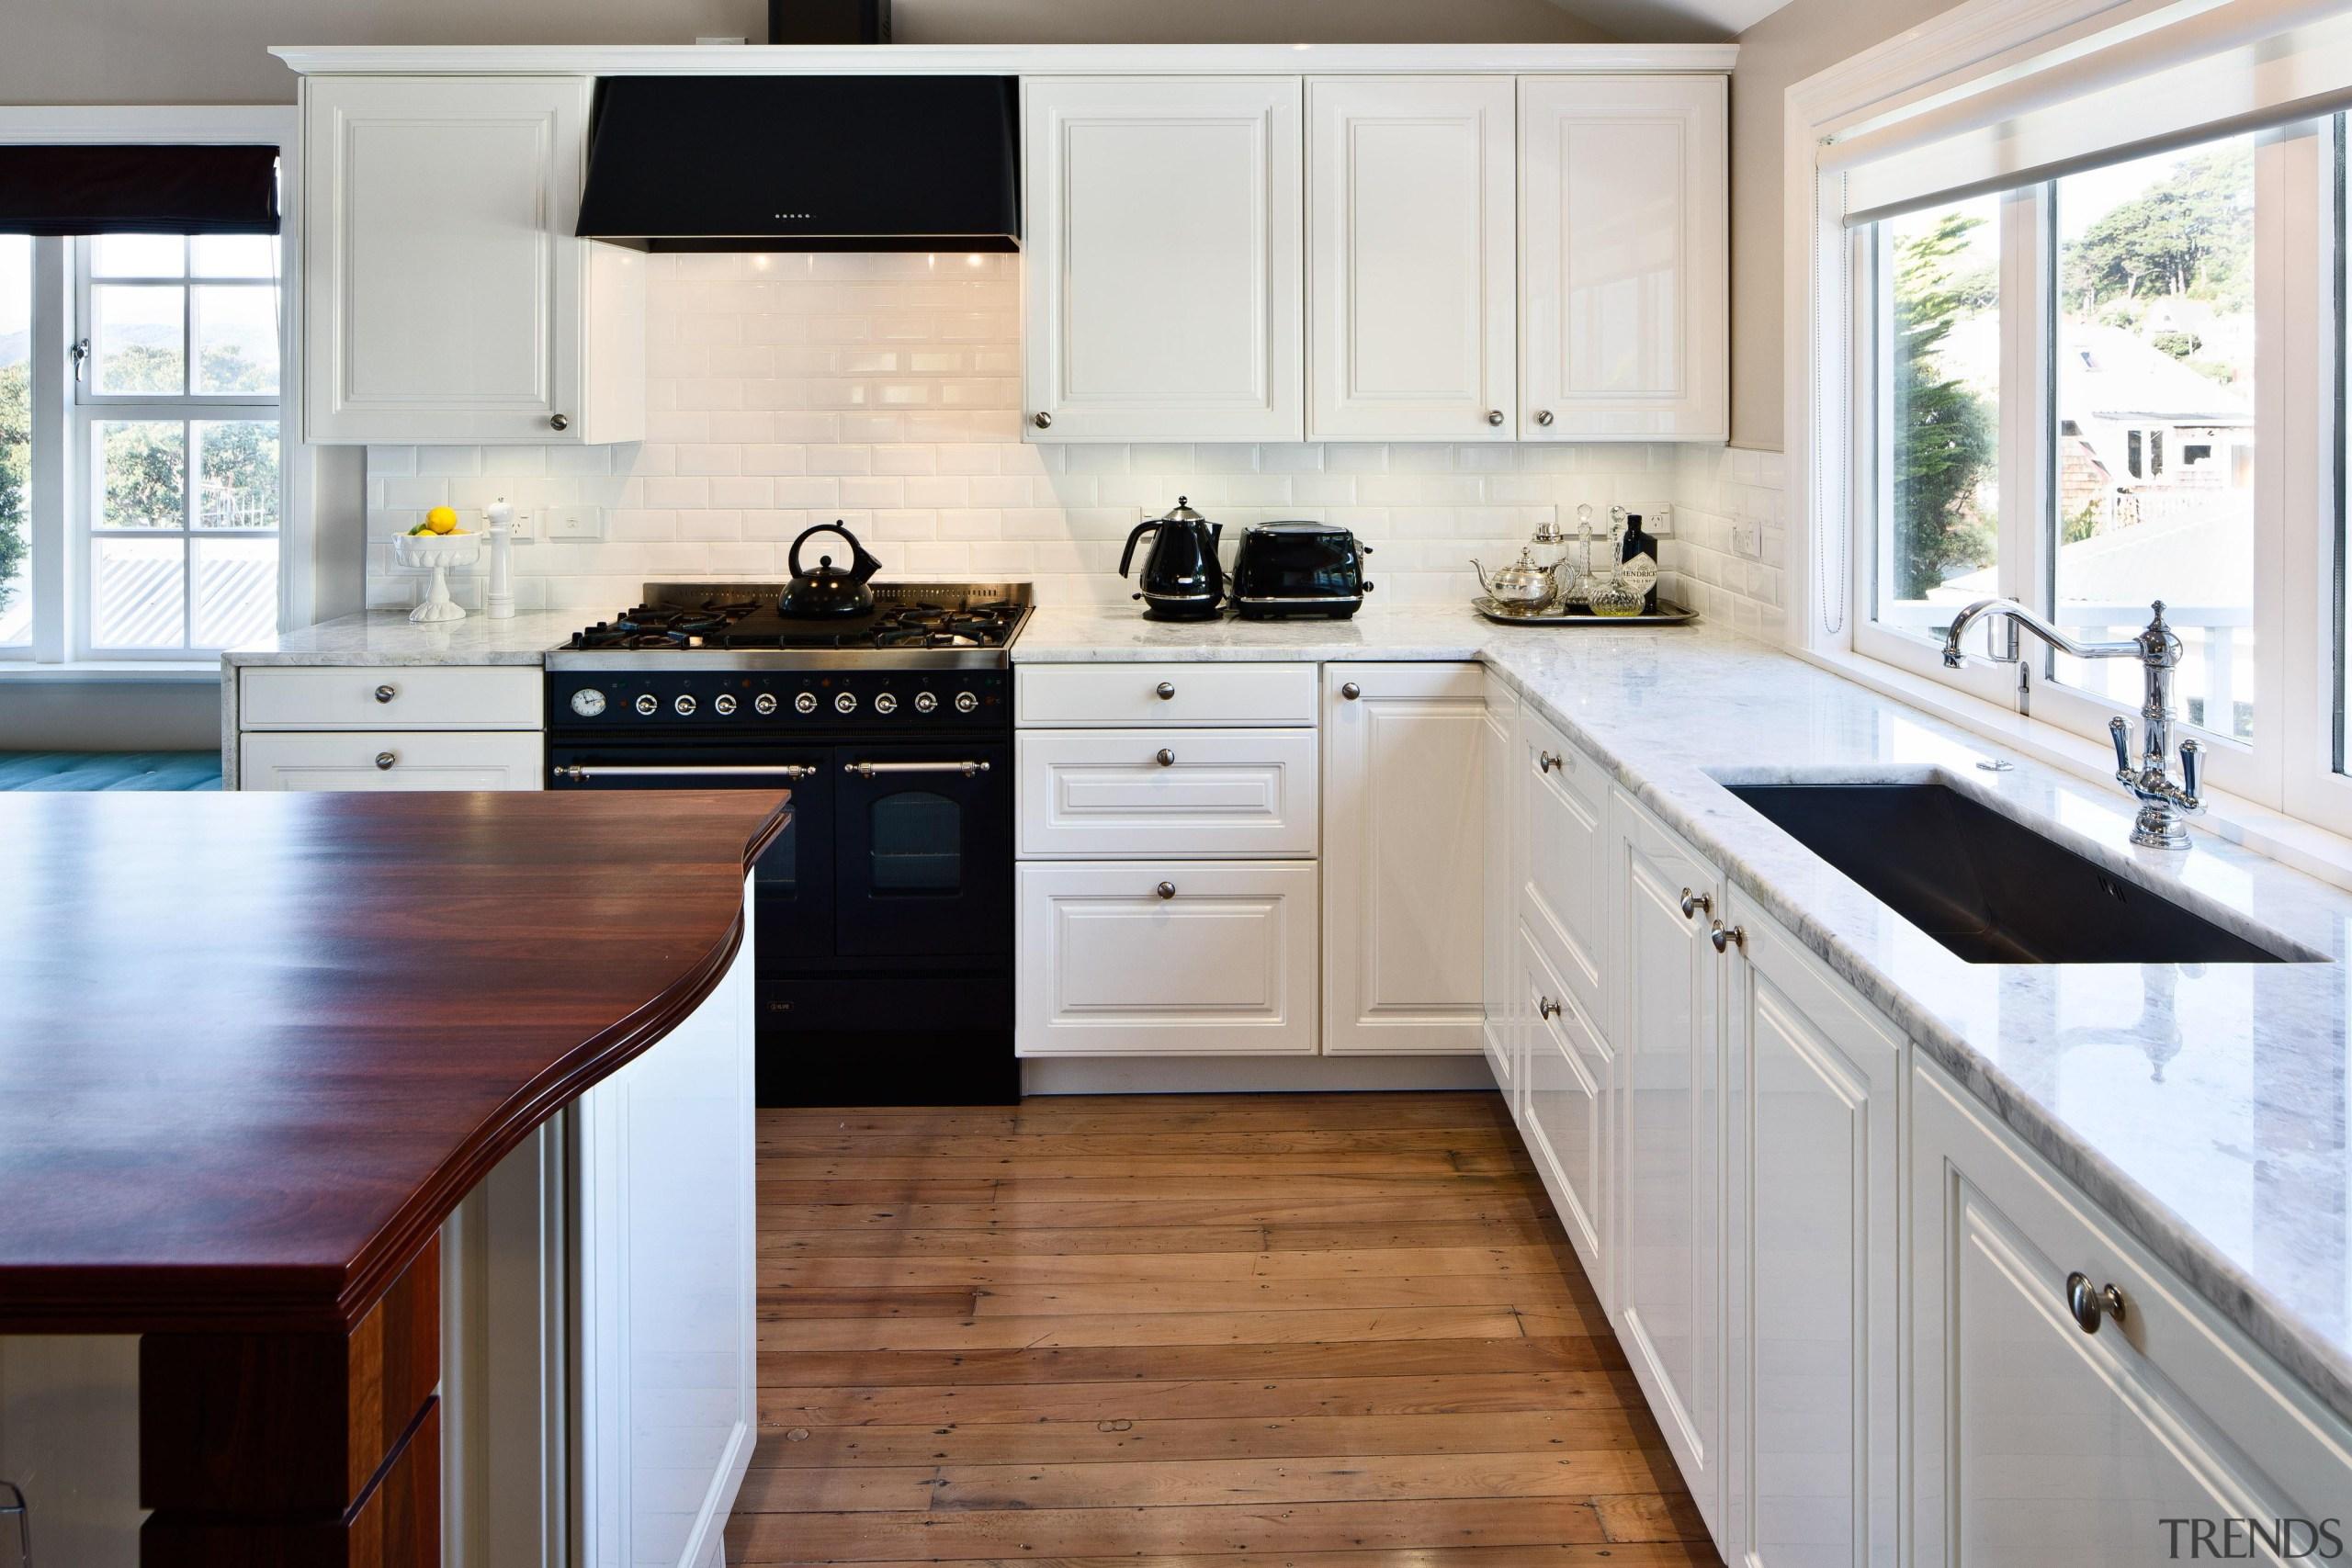 Wellington Kitchen of the Year 2013National Kitchen and cabinetry, countertop, cuisine classique, floor, flooring, hardwood, interior design, kitchen, laminate flooring, room, wood, wood flooring, white